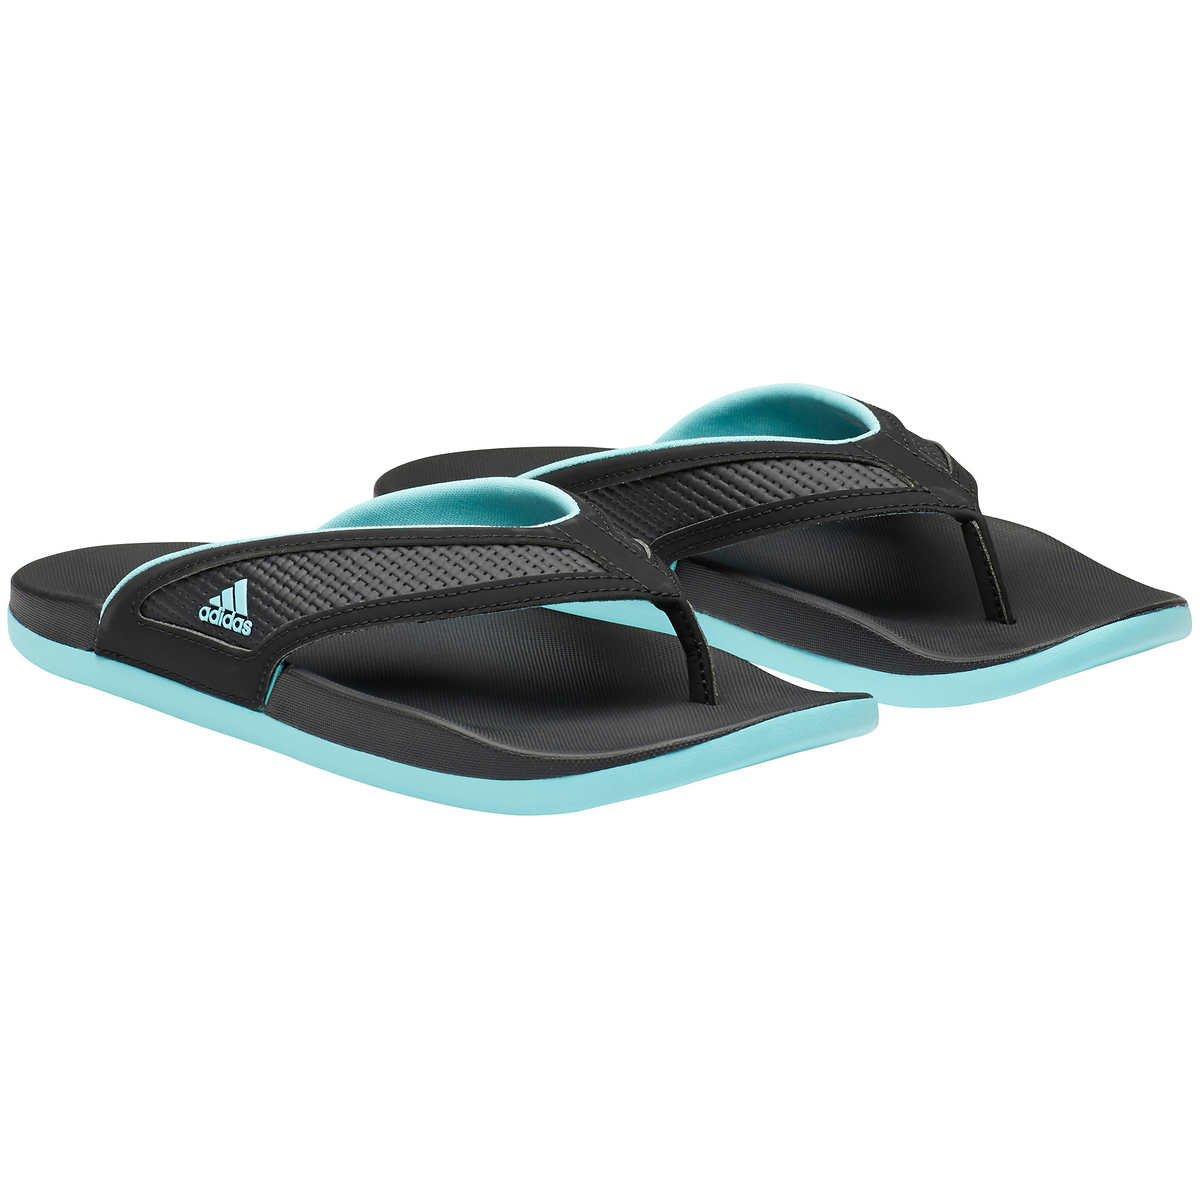 0cc7bf5da7a0c Sandals for women adilette sandal sandals jpg 1200x1200 Costco adidas flip  flops